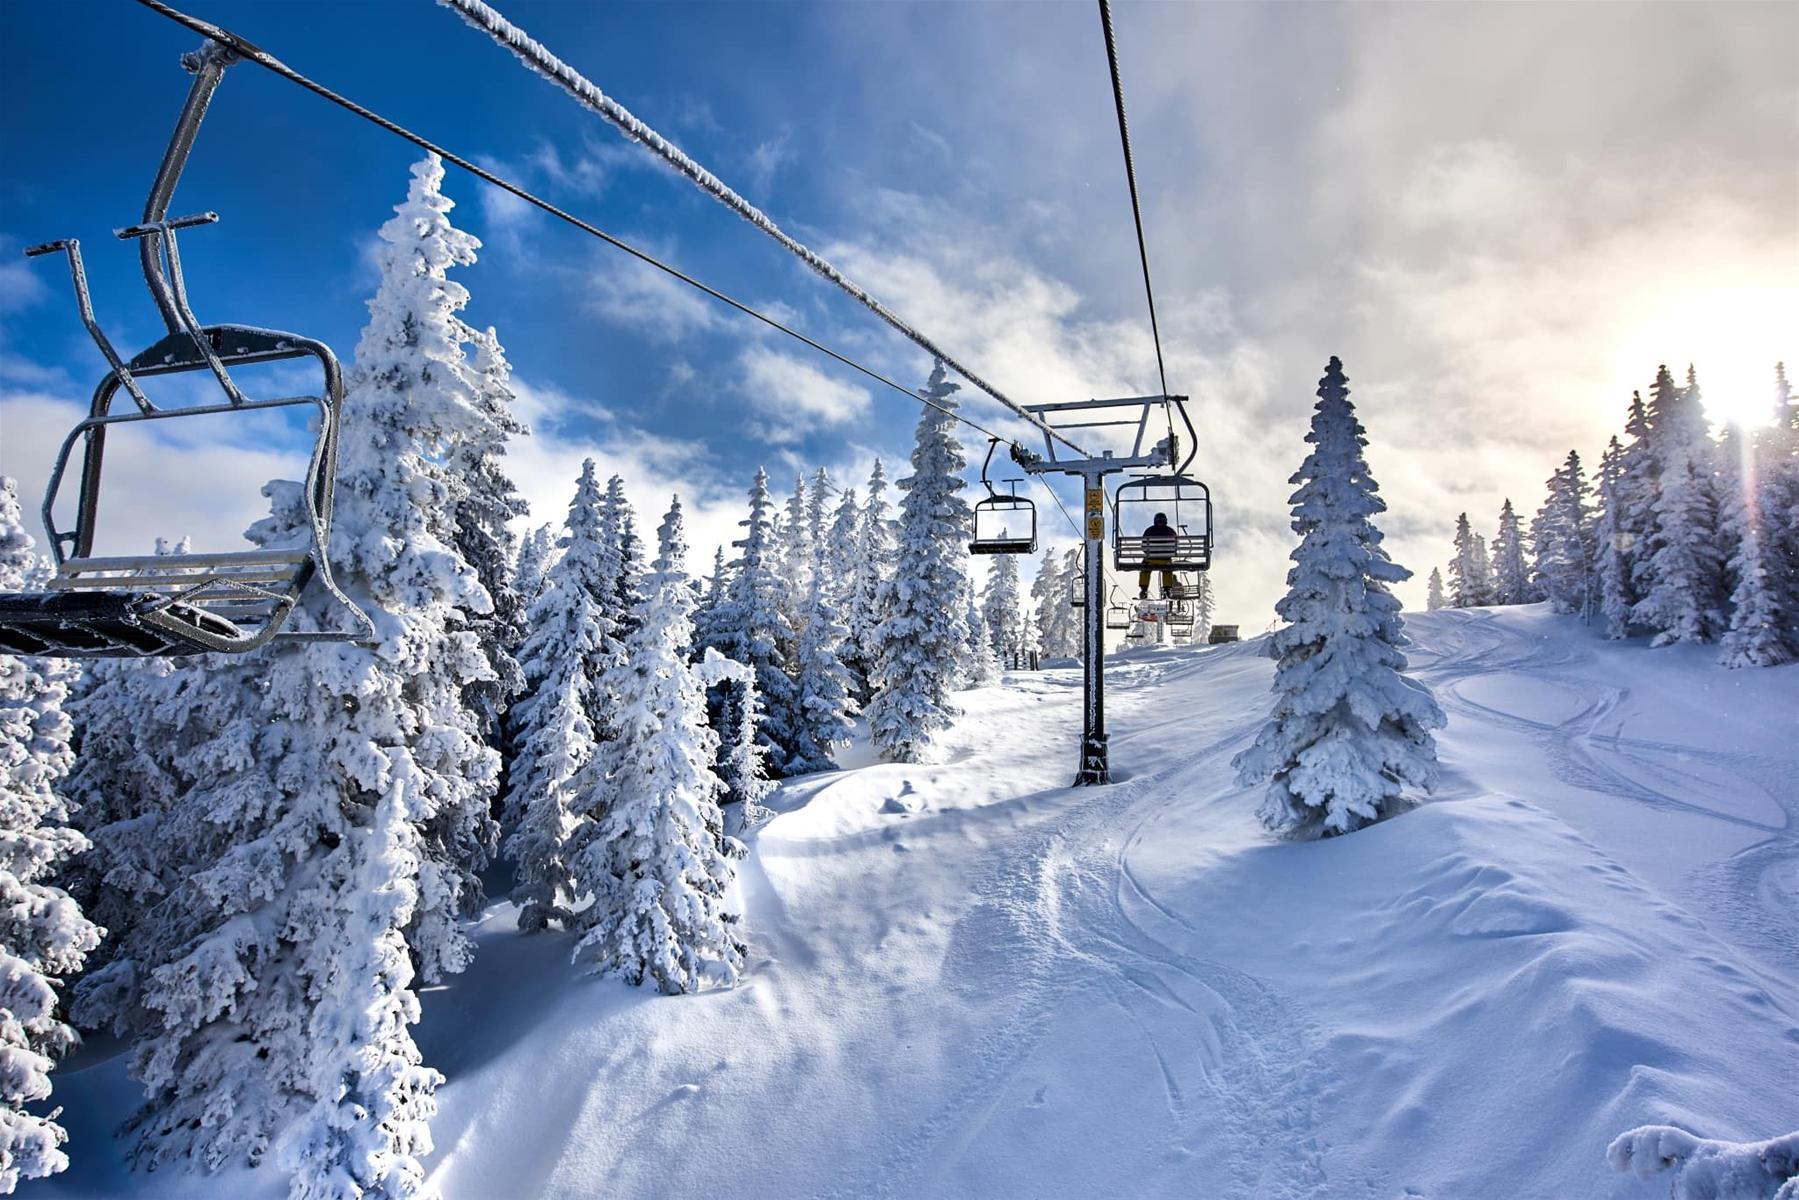 ski santa fe chairlift and lift line